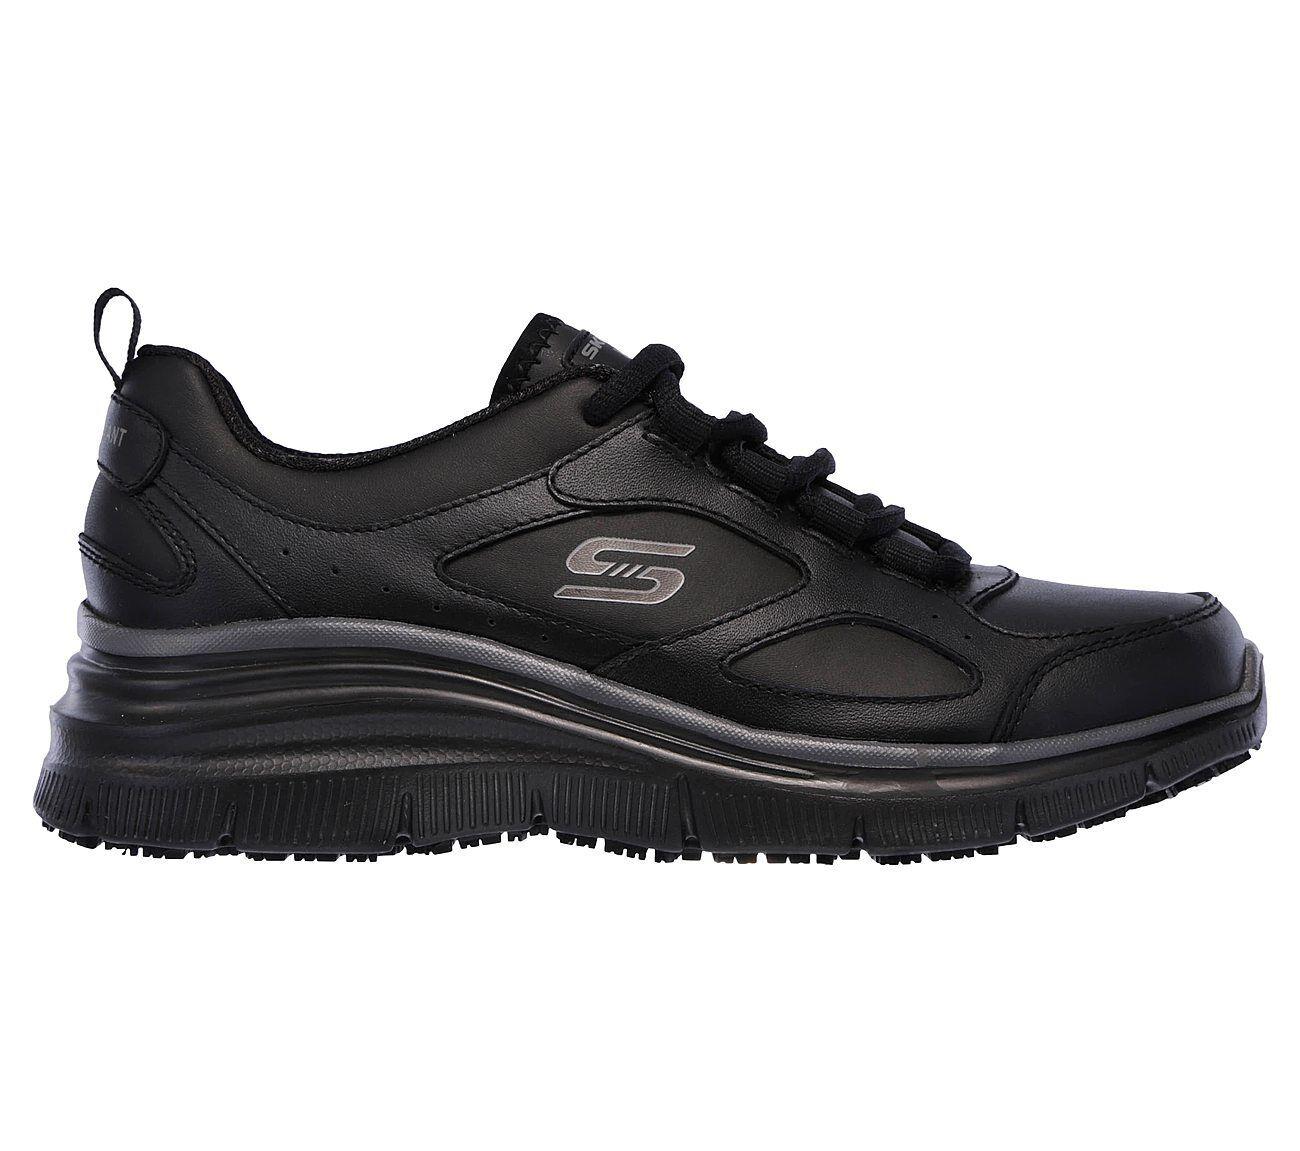 76604 Womens Skechers Work Relaxed Fit Carrolton Slip Slip Slip Resistant shoes Black 9d74f6